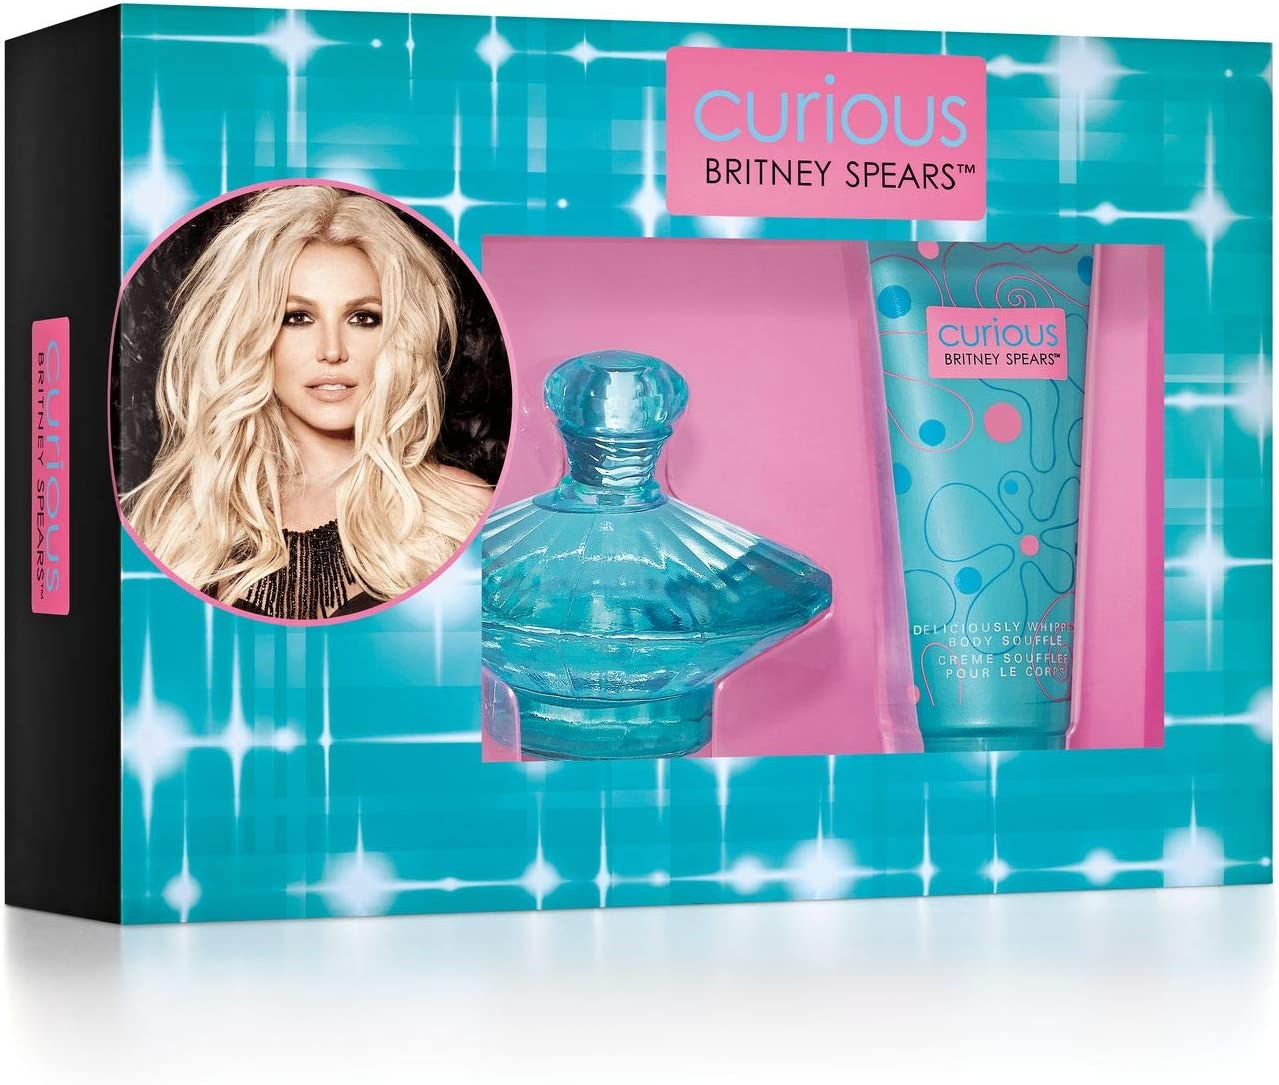 Britney Spears Curious estuche agua de perfume aerosol 100 ml/crema soplado para cuerpo 100 ml: Amazon.es: Belleza